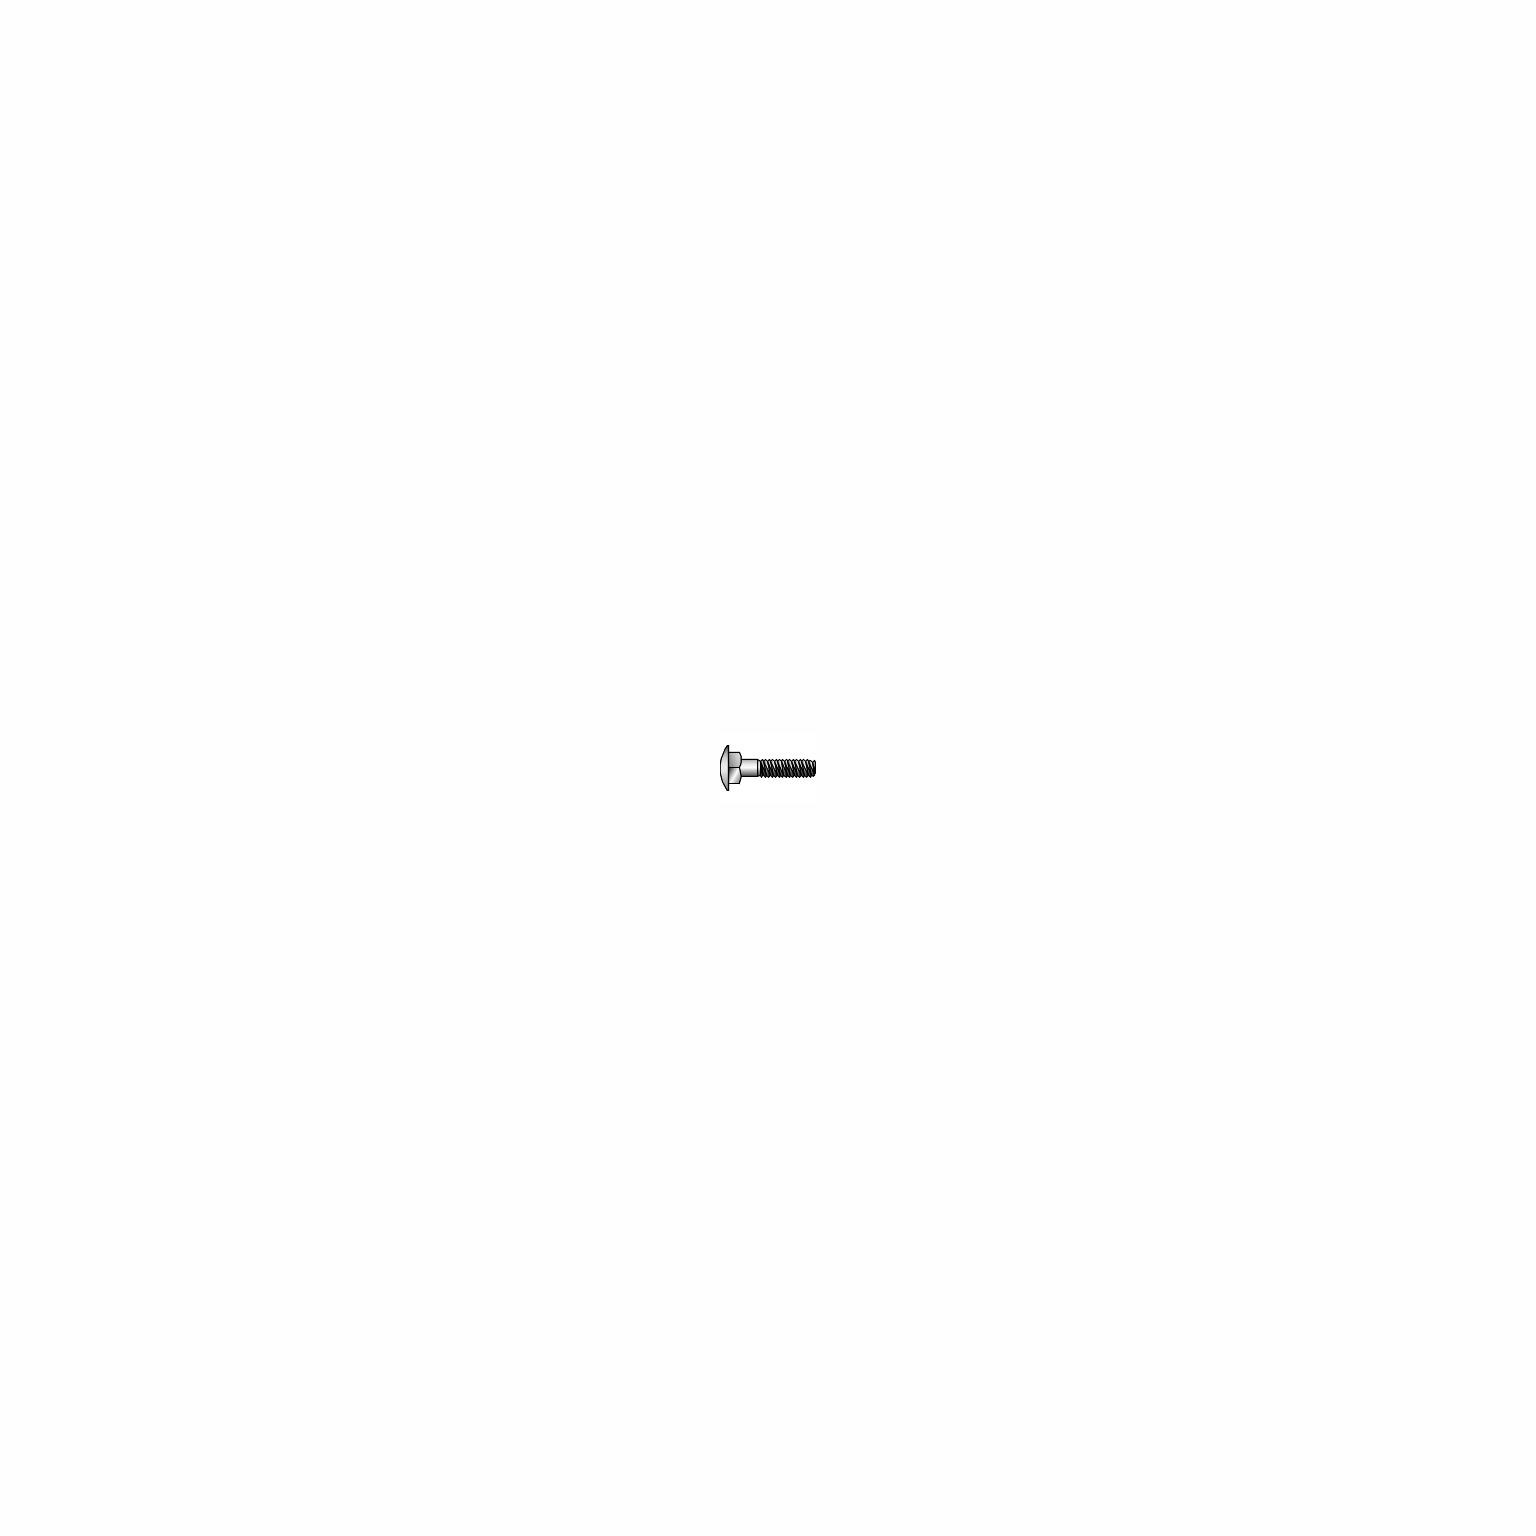 Nya VAGNSBULT MVBF FZB M10X150 2P | Beijer Byggmaterial NA-72